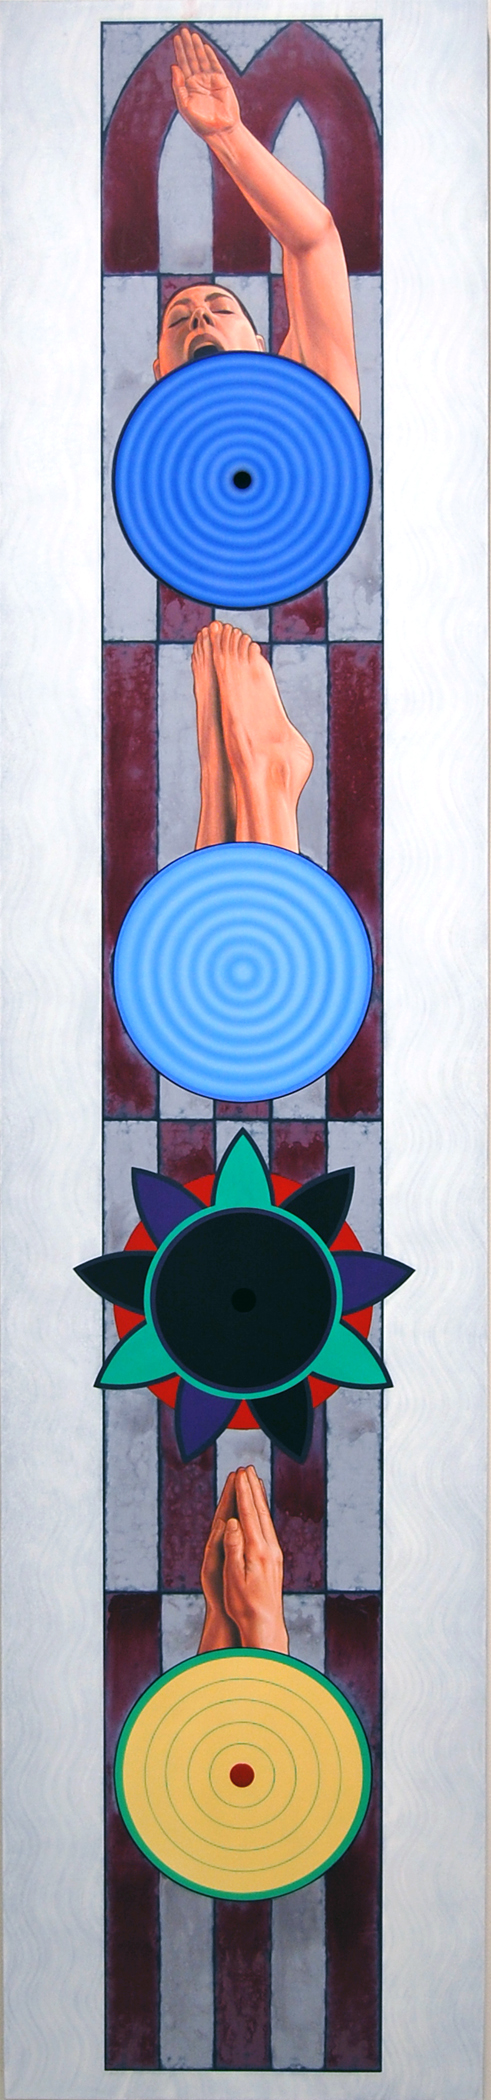 Don Suggs Tondototem 2D3 (piety deity faith fate)